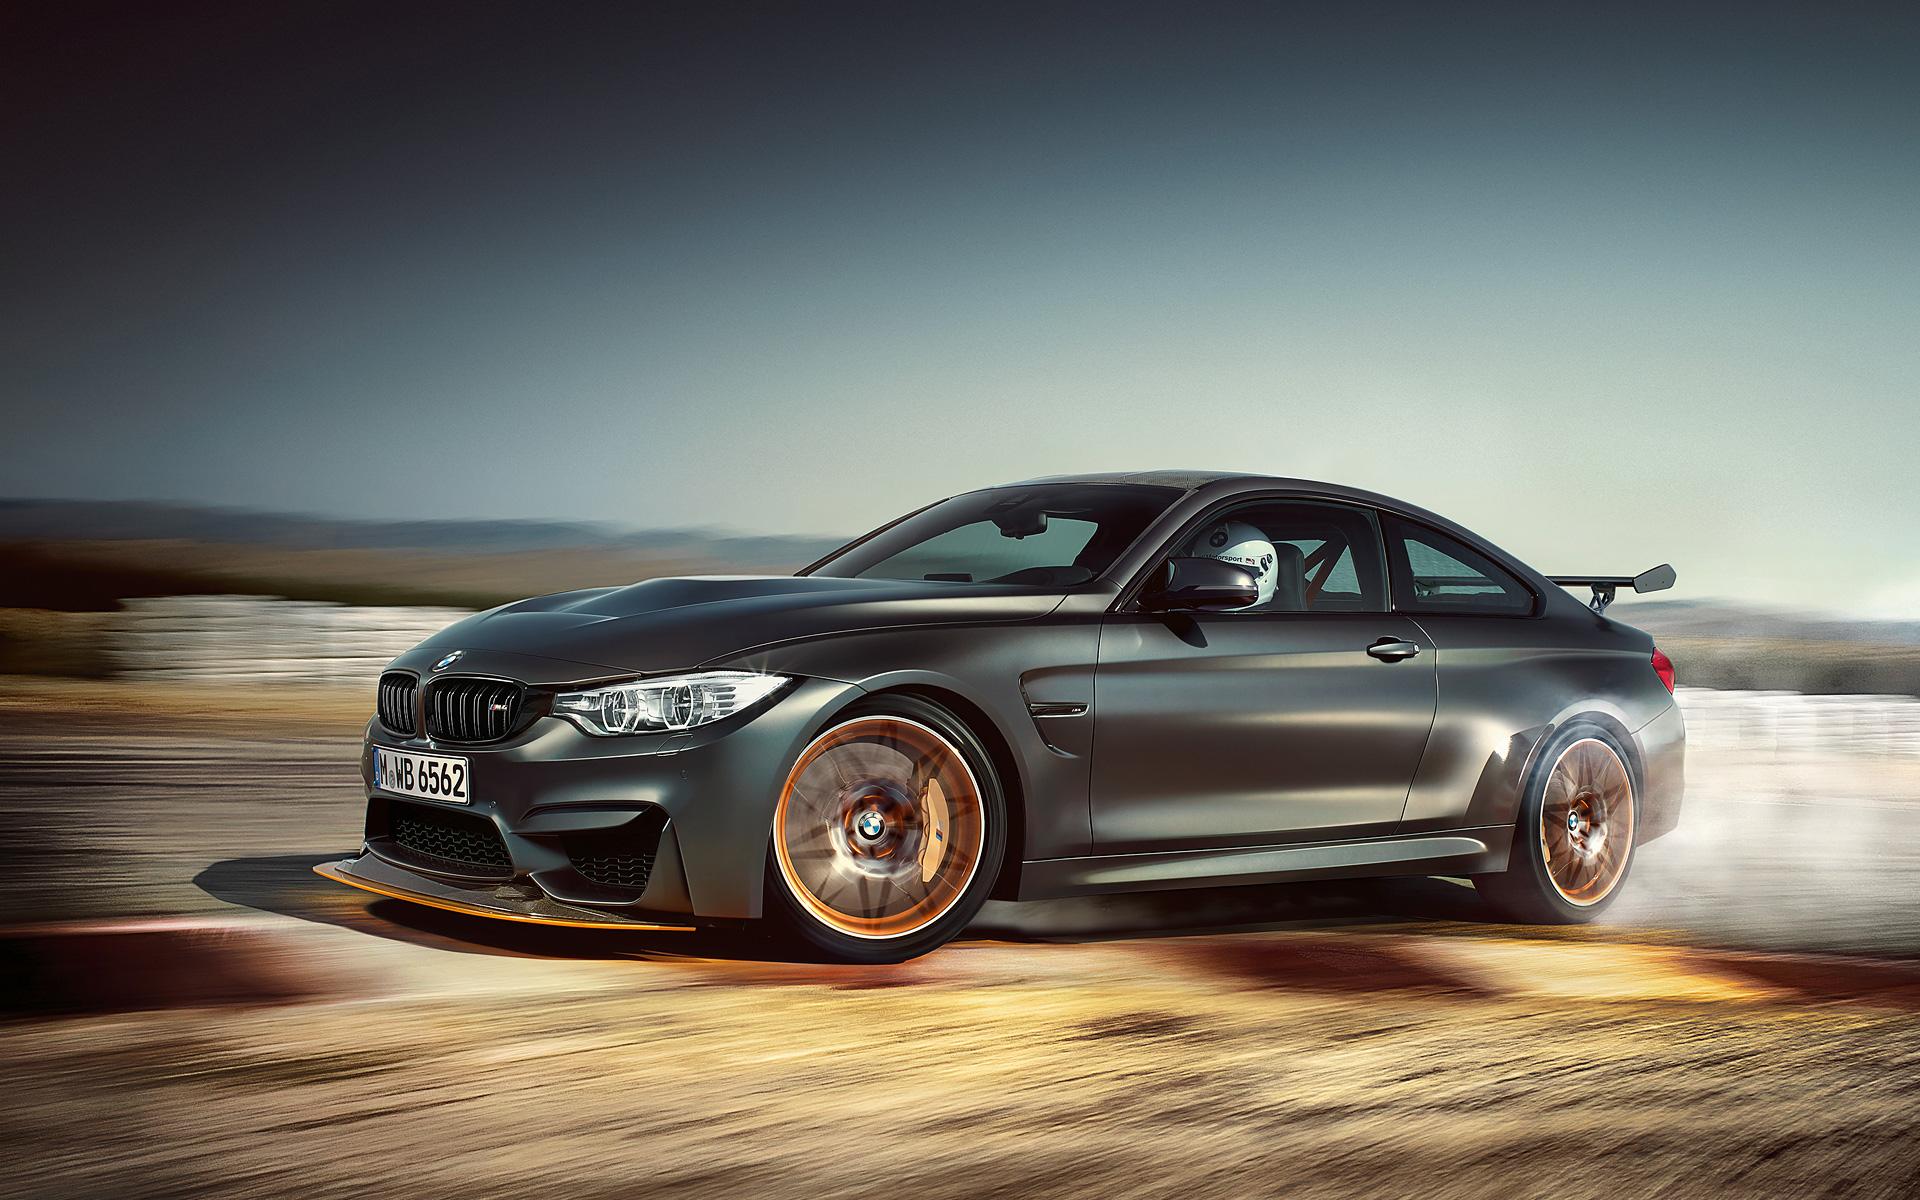 BMW je zaključil proizvodnjo modela M4 GTSBMWBLOG